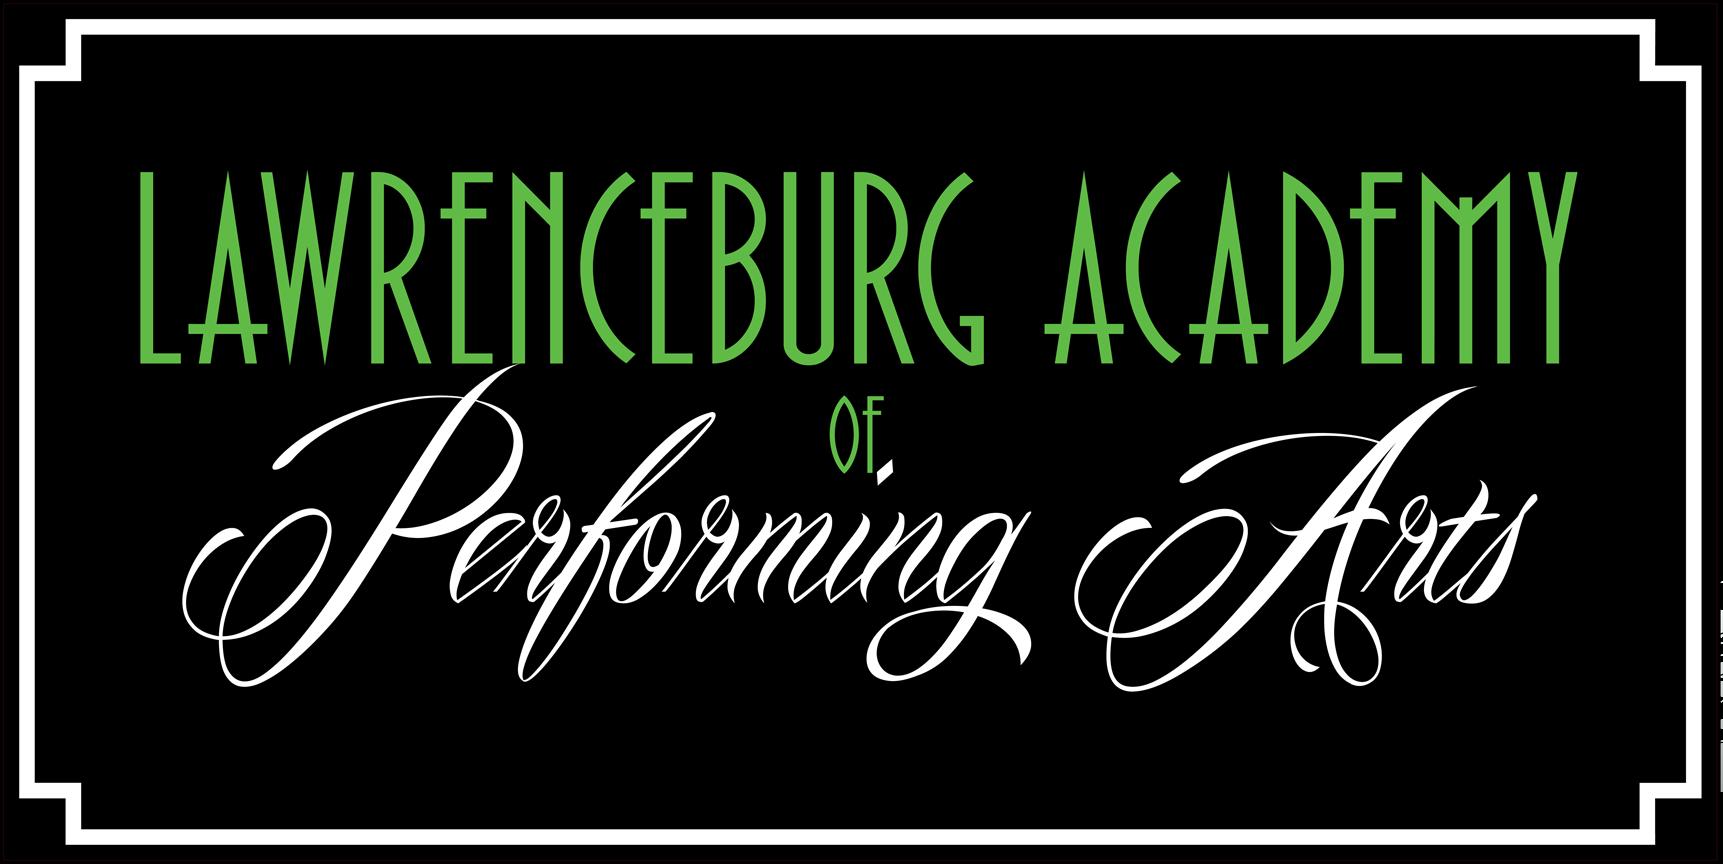 Lawrenceburg Academy of Performing Arts